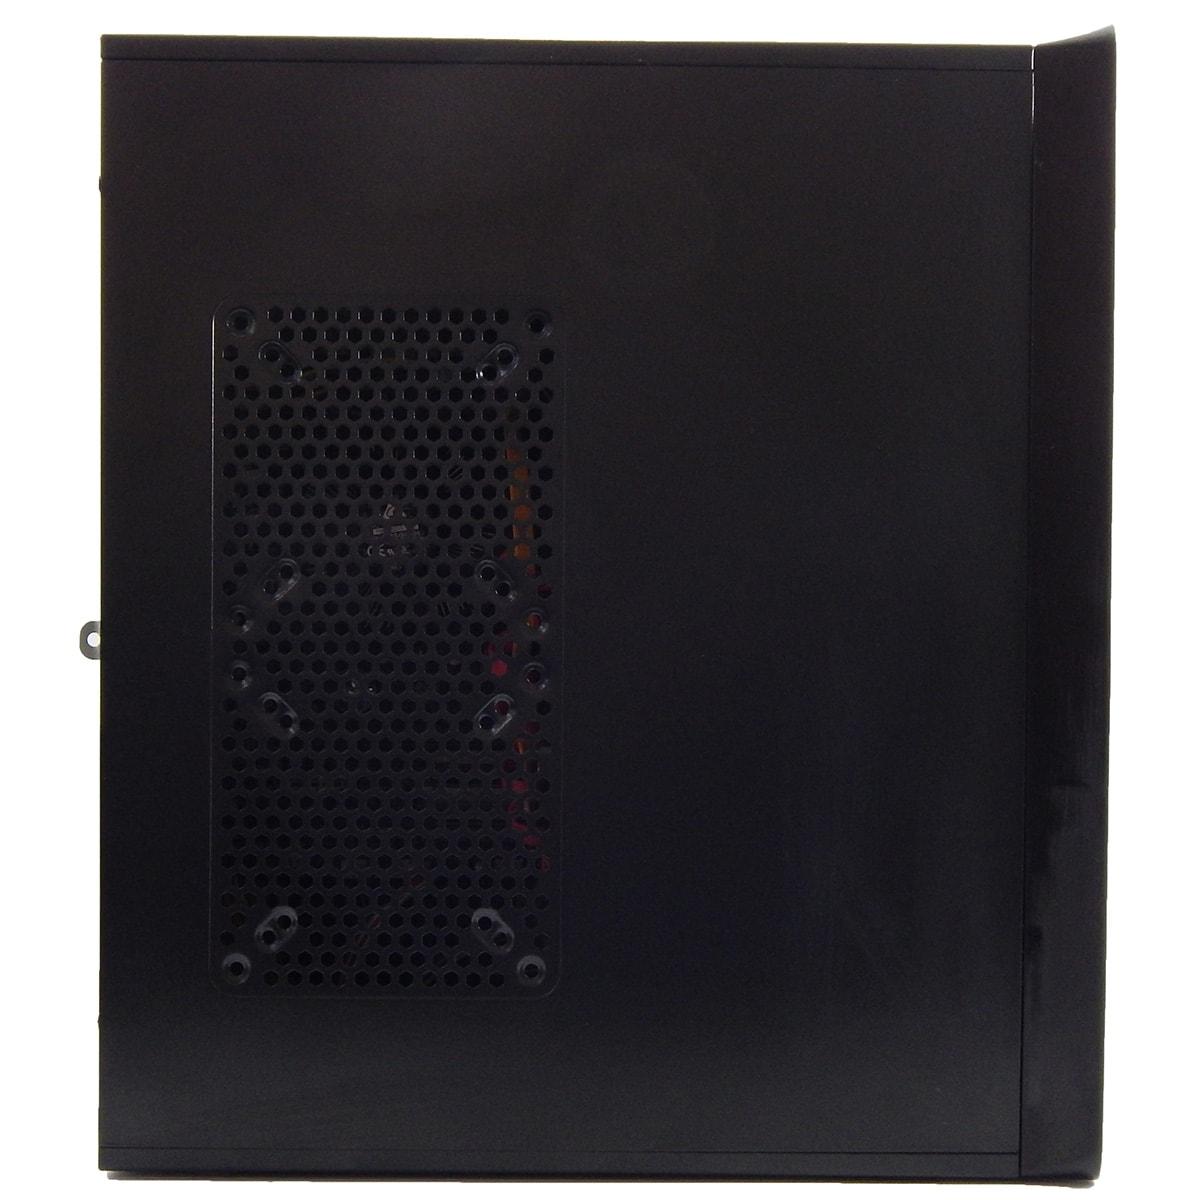 PC POSITIVO PREMIUM DRI9432 I5-4430 8Gb 500Gb Gravador Dvd - Reembalado